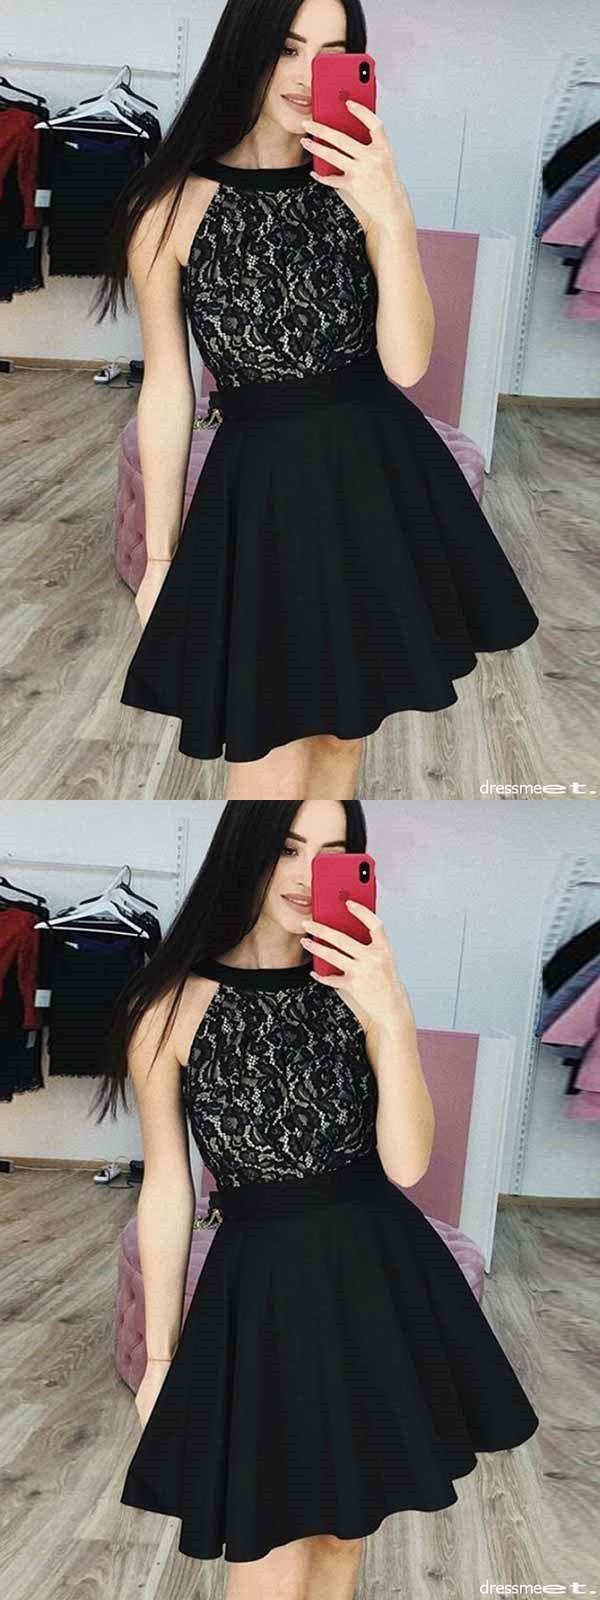 Black lace homecoming dress party cheap chiffon homecoming dress